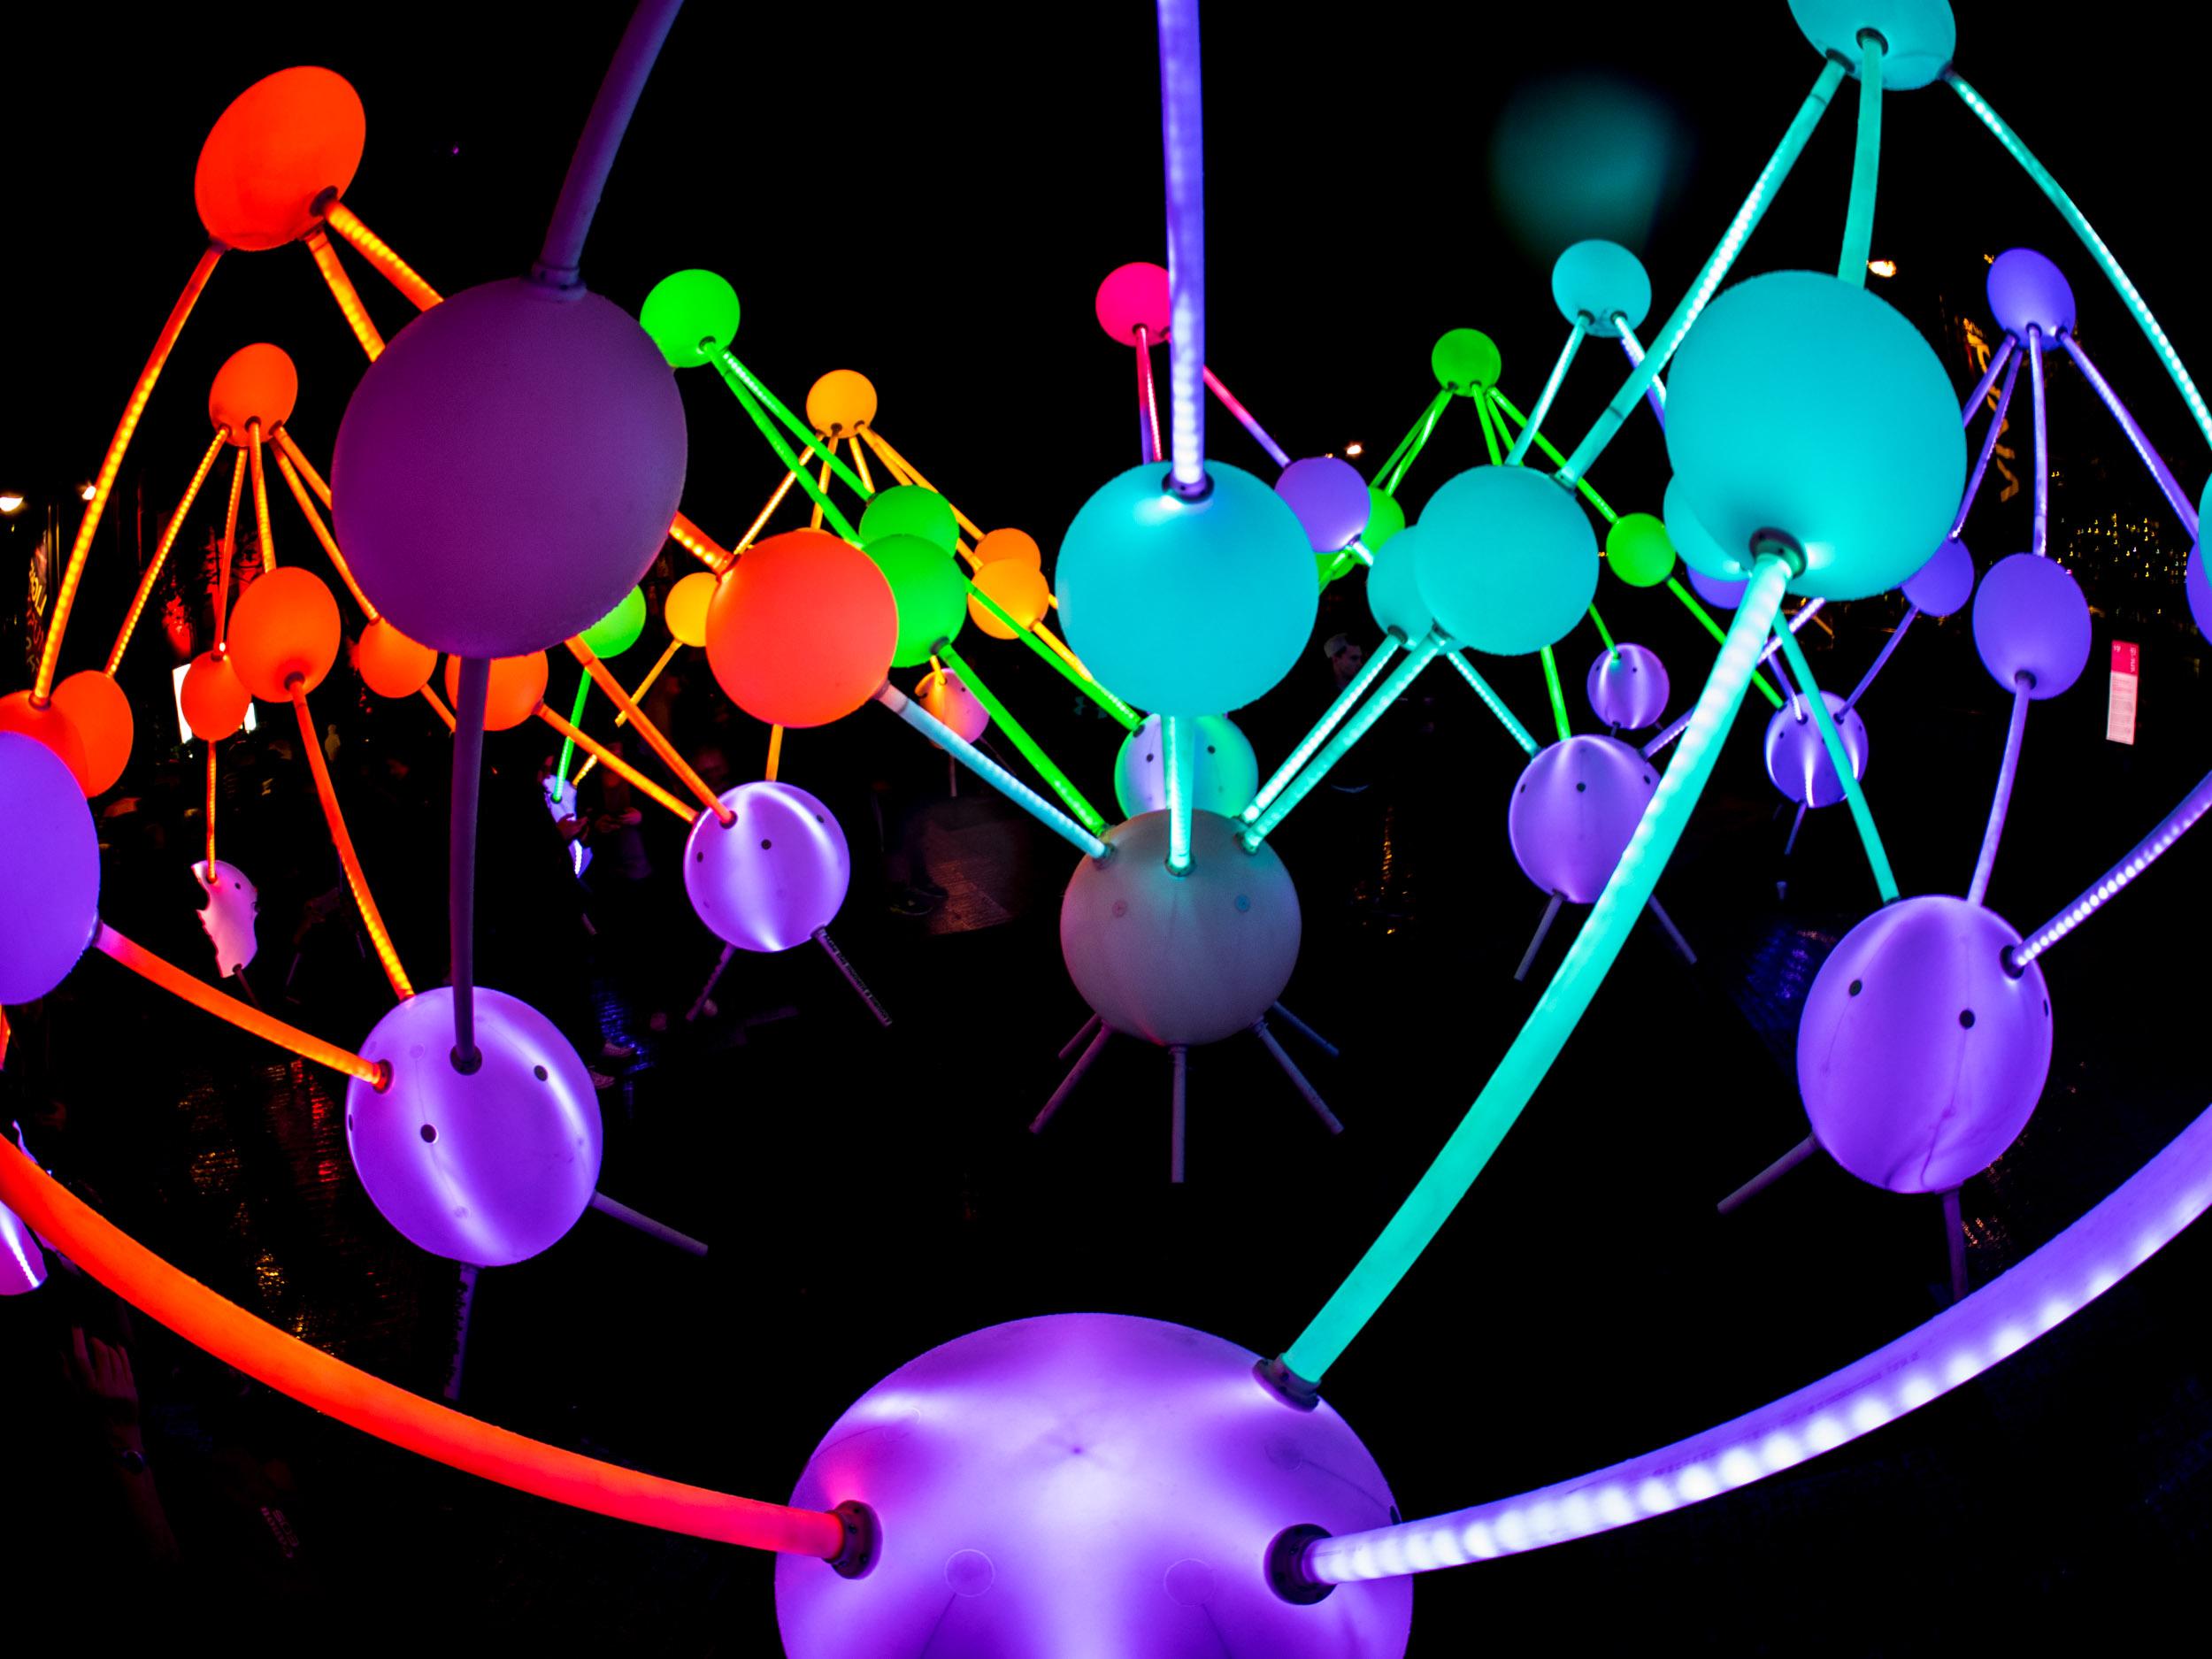 vivid lights photography courses sydney-1-2.jpg